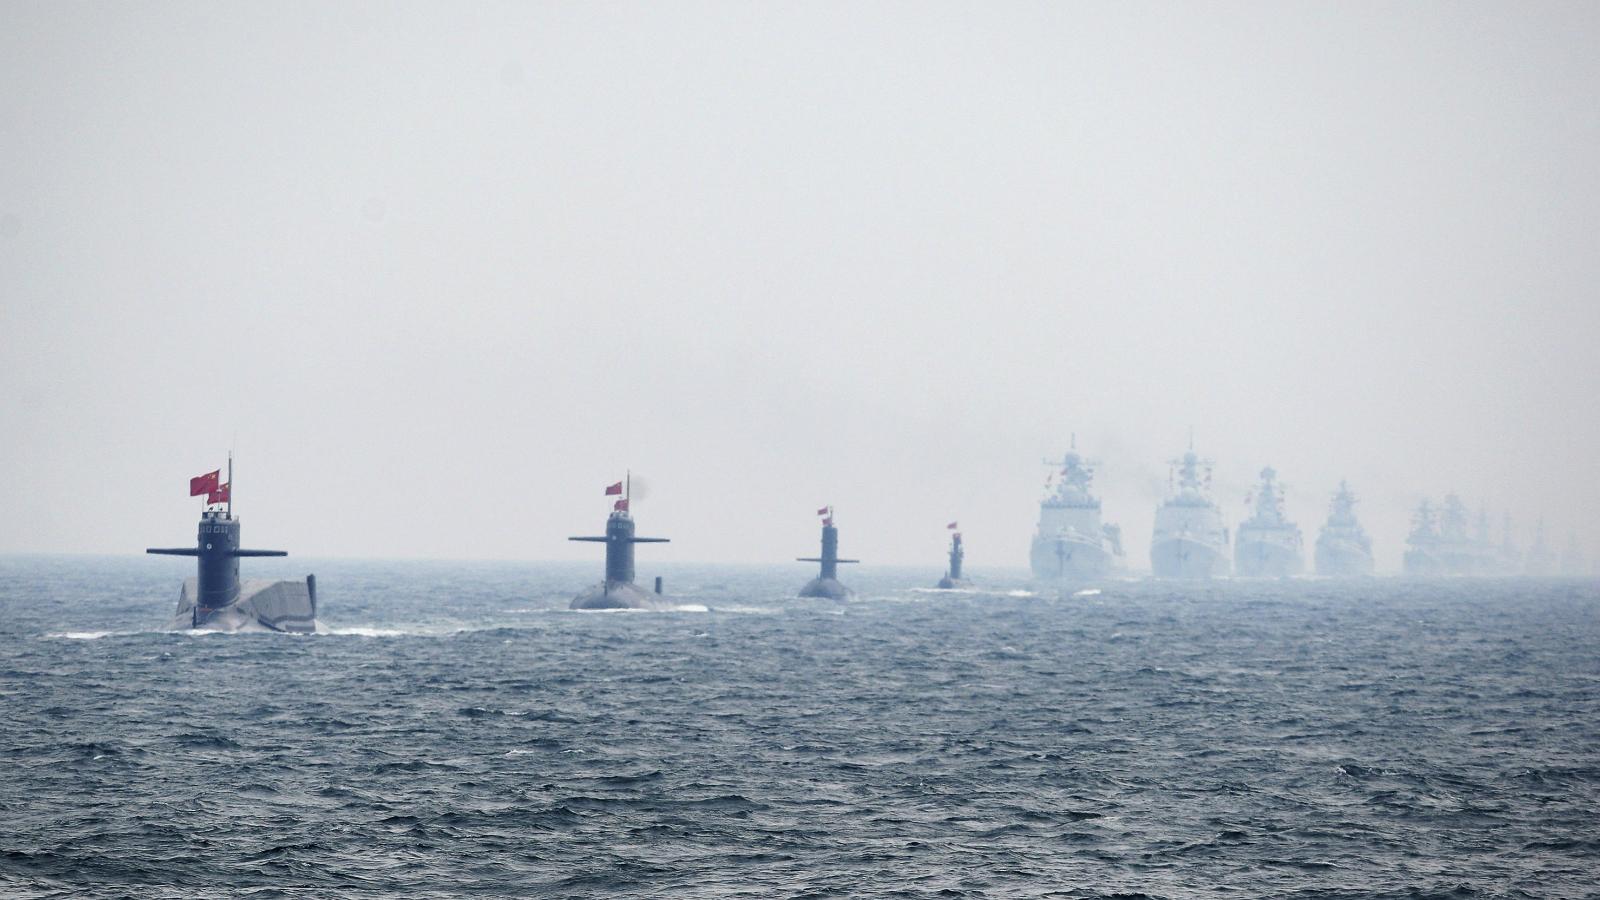 India-China-Foreign policy-Diplomacy-Navy-Submarines-Warship